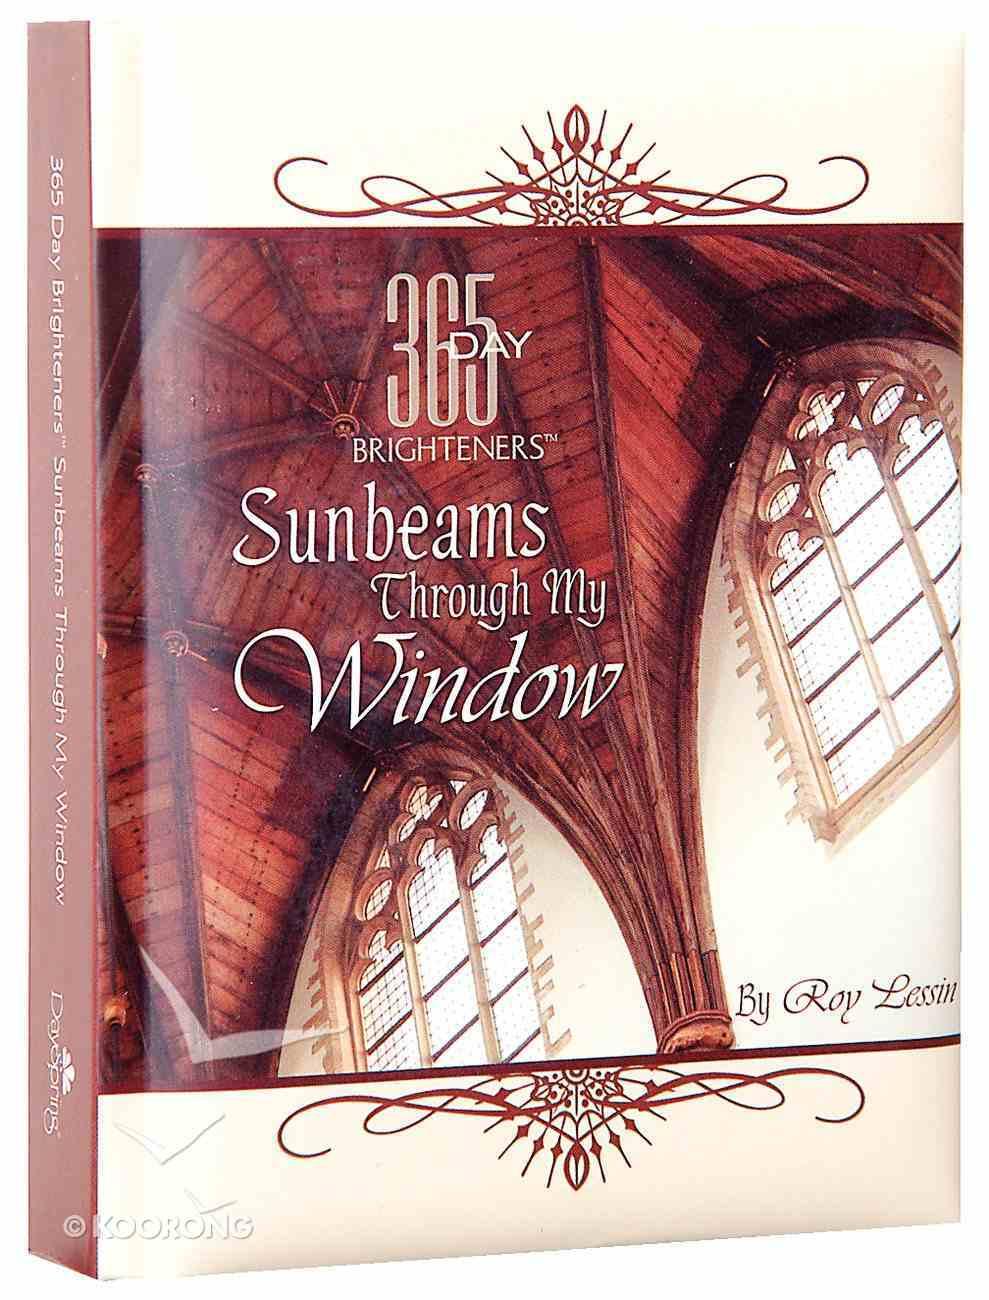 Sunbeams Through My Window (365 Day Brighteners Series) Hardback